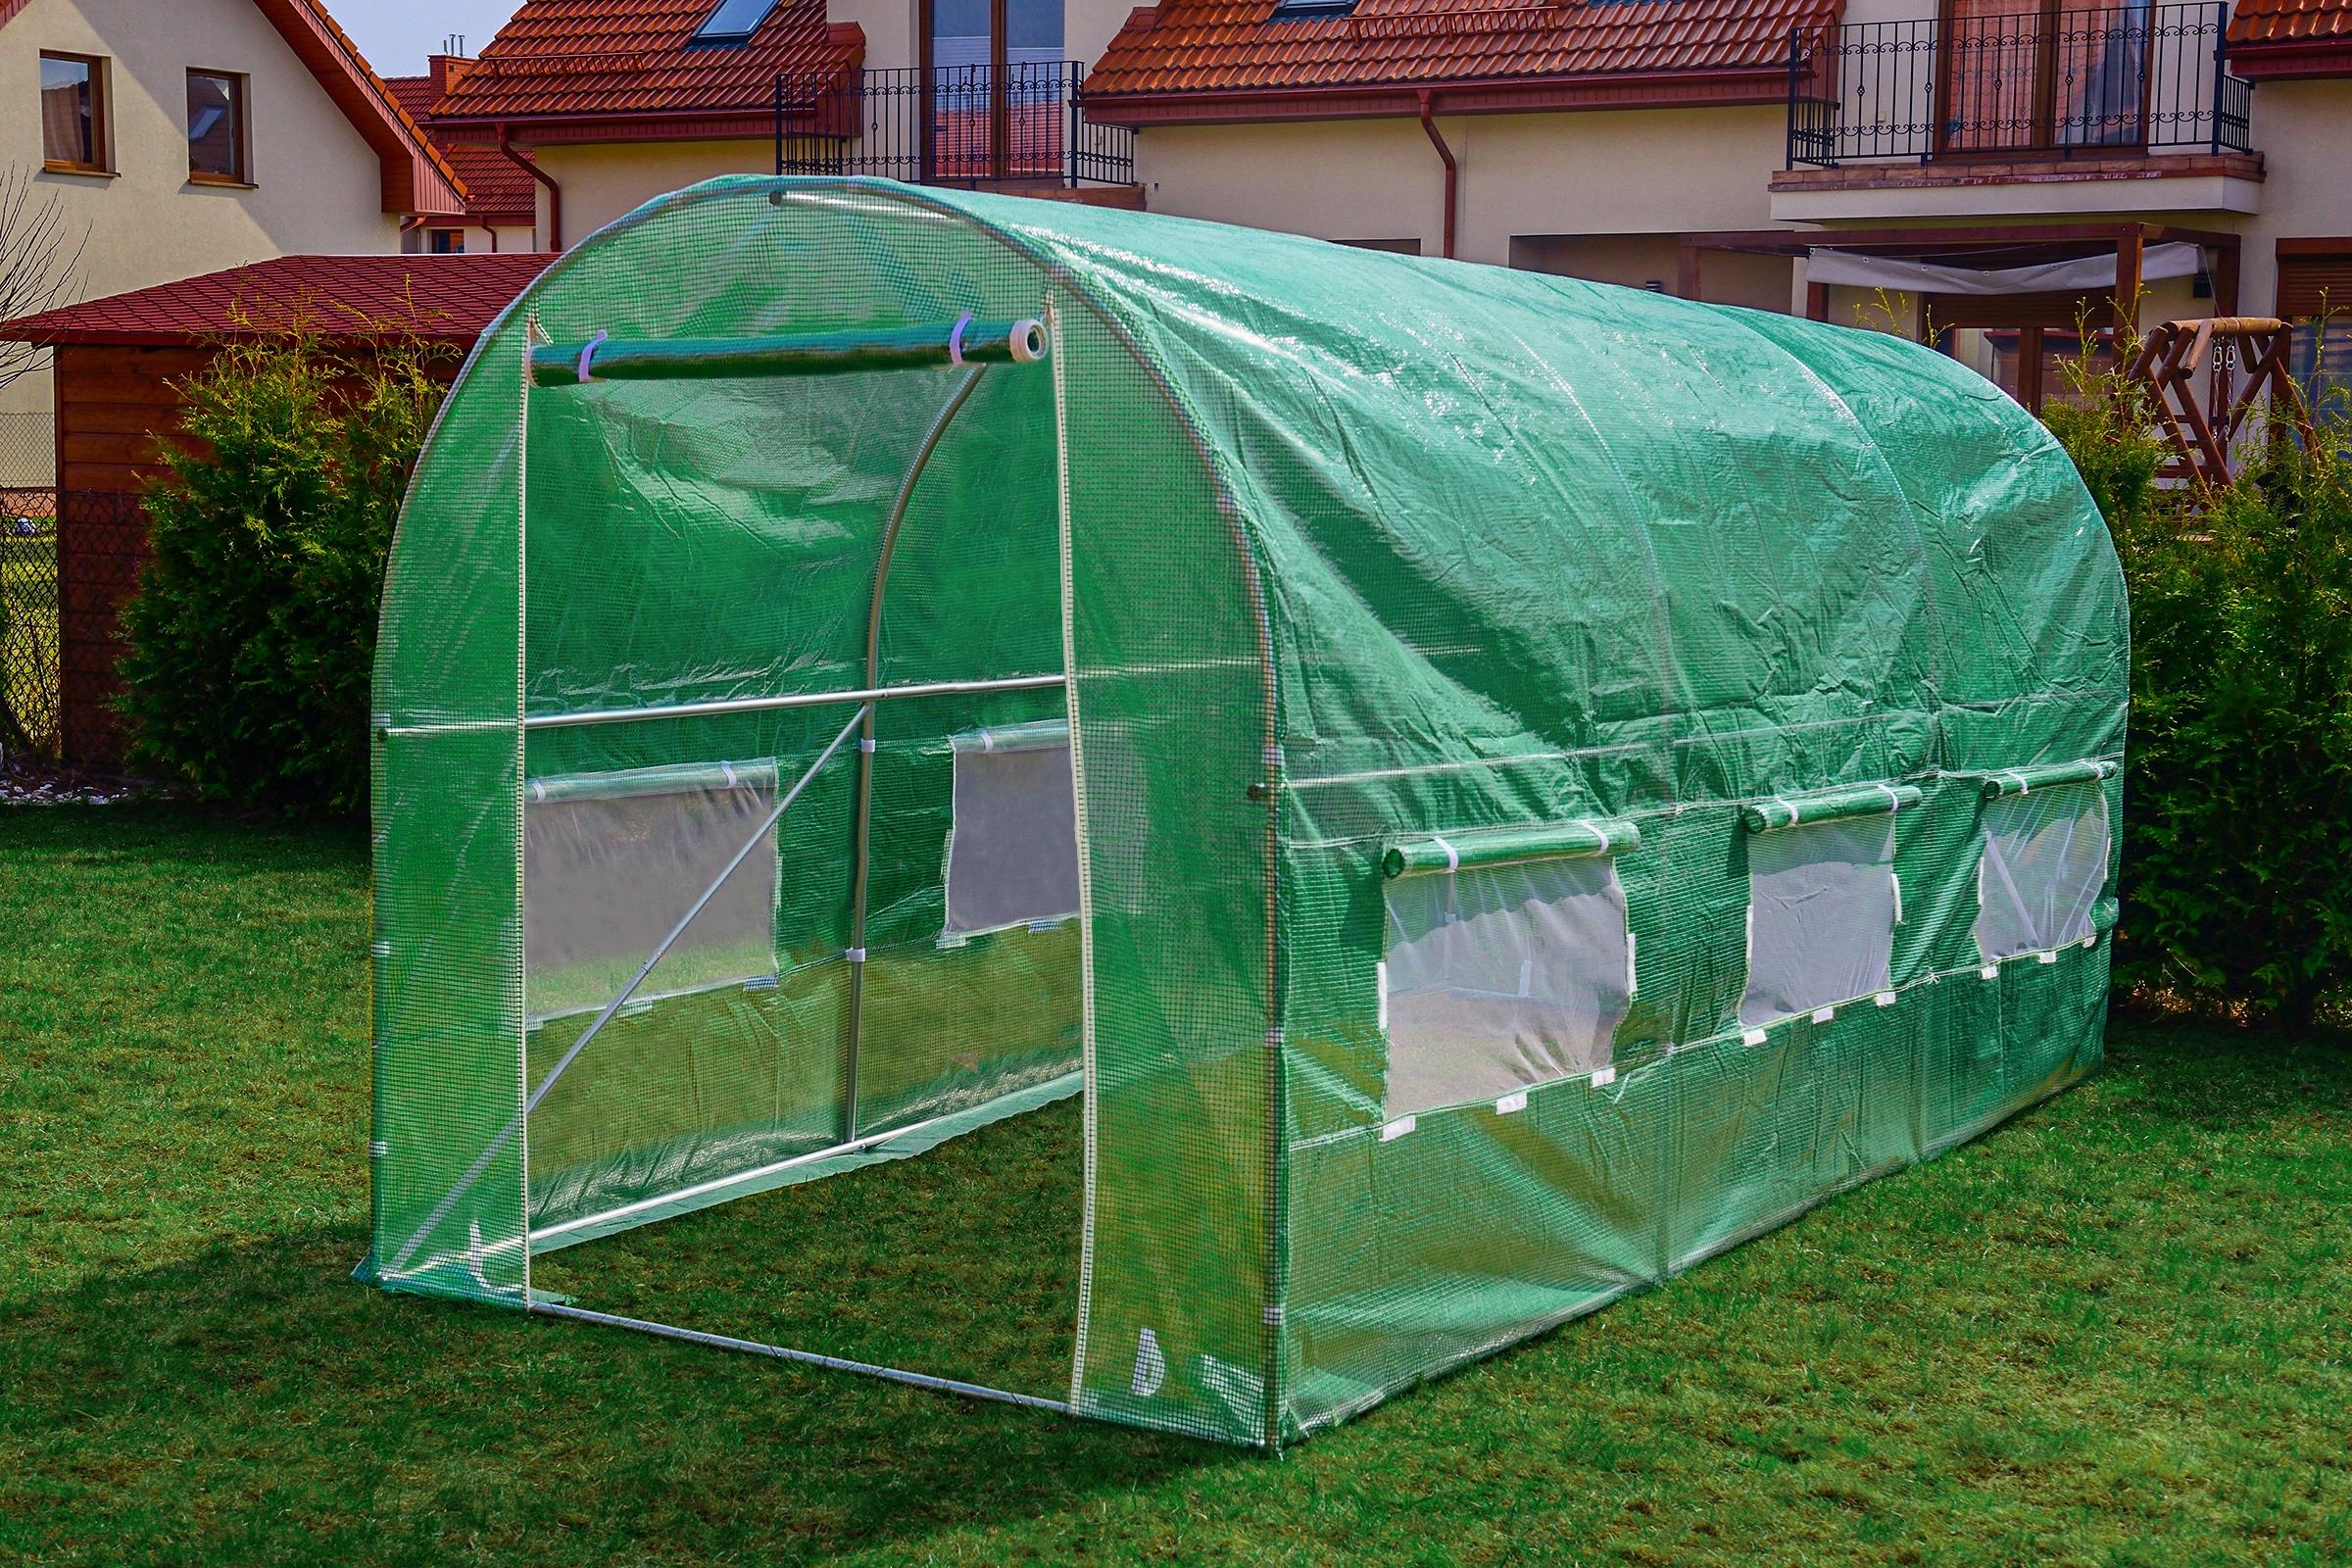 FÓLOVÝ TUNEL 7m2 ZAHRADA GREENHOUSE 3,5x2m UV-4 Výrobca Funfit Garden